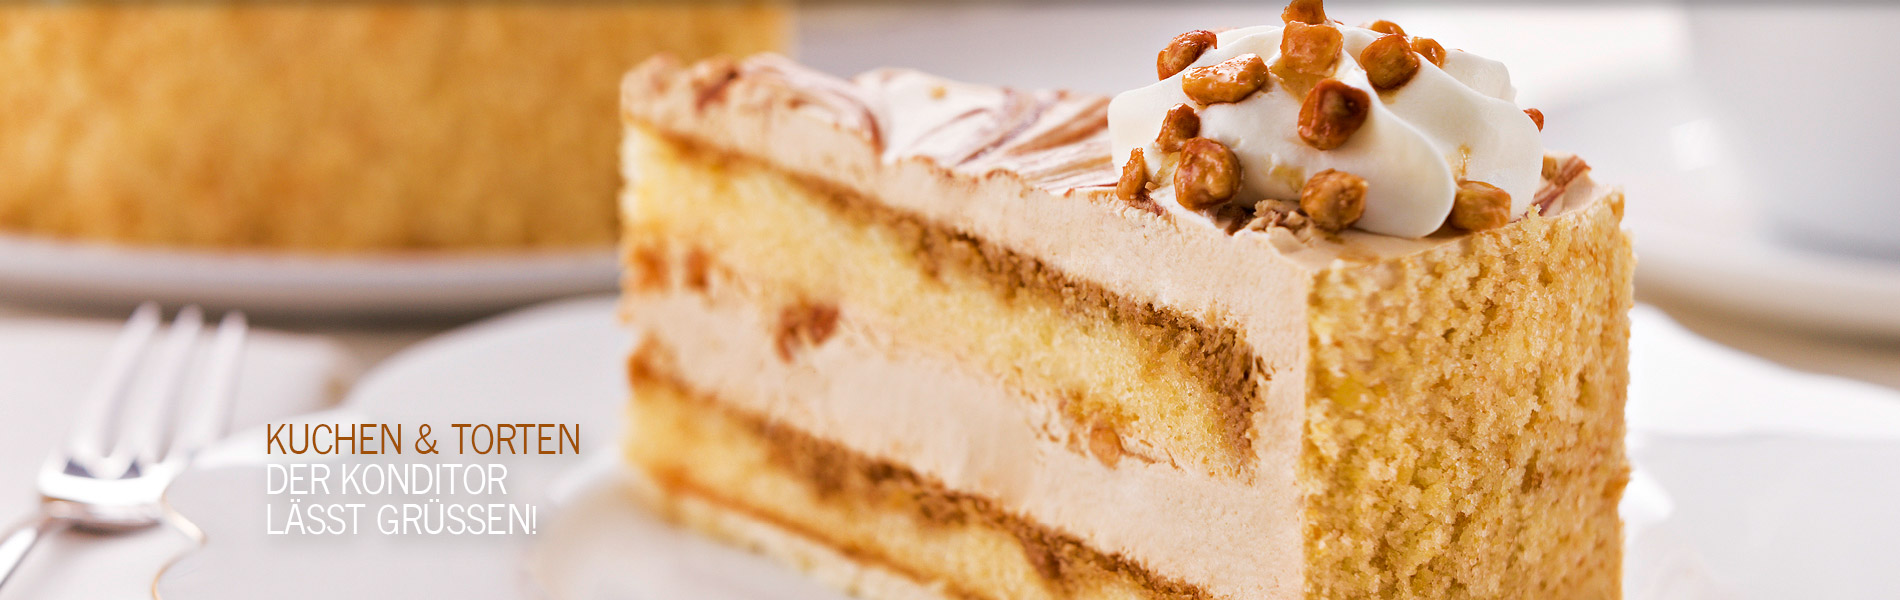 Kuchen Torten Blechkuchen Sahneschnitten Snacks Prima Food